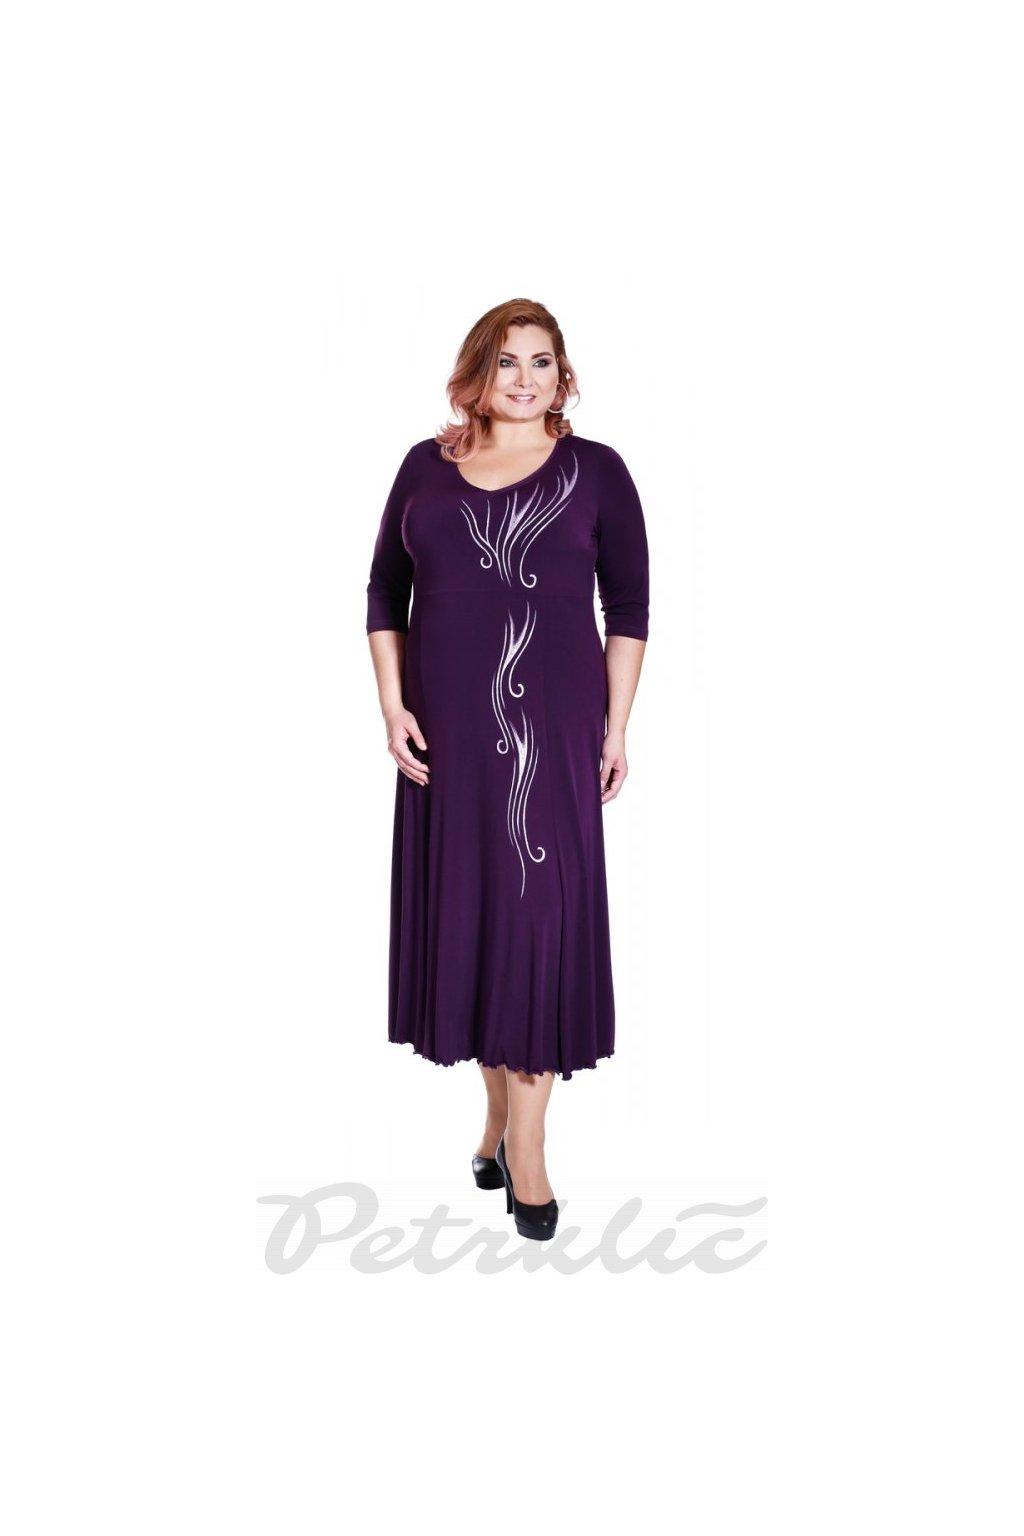 MÁJA - šaty 3/4 rukáv 130 - 135 cm